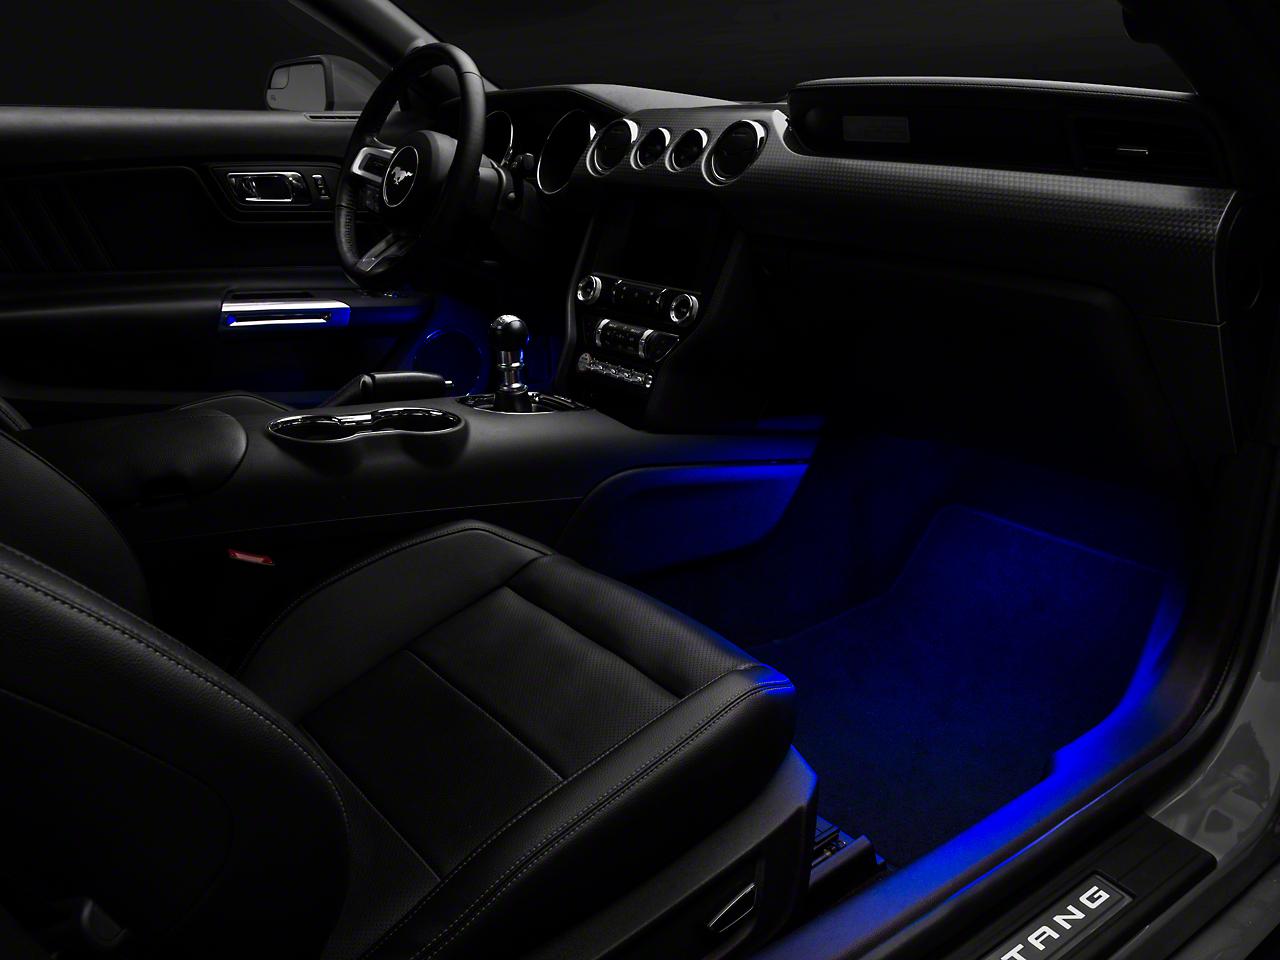 Raxiom LED Footwell Lighting Kit - Blue (15-17 All)